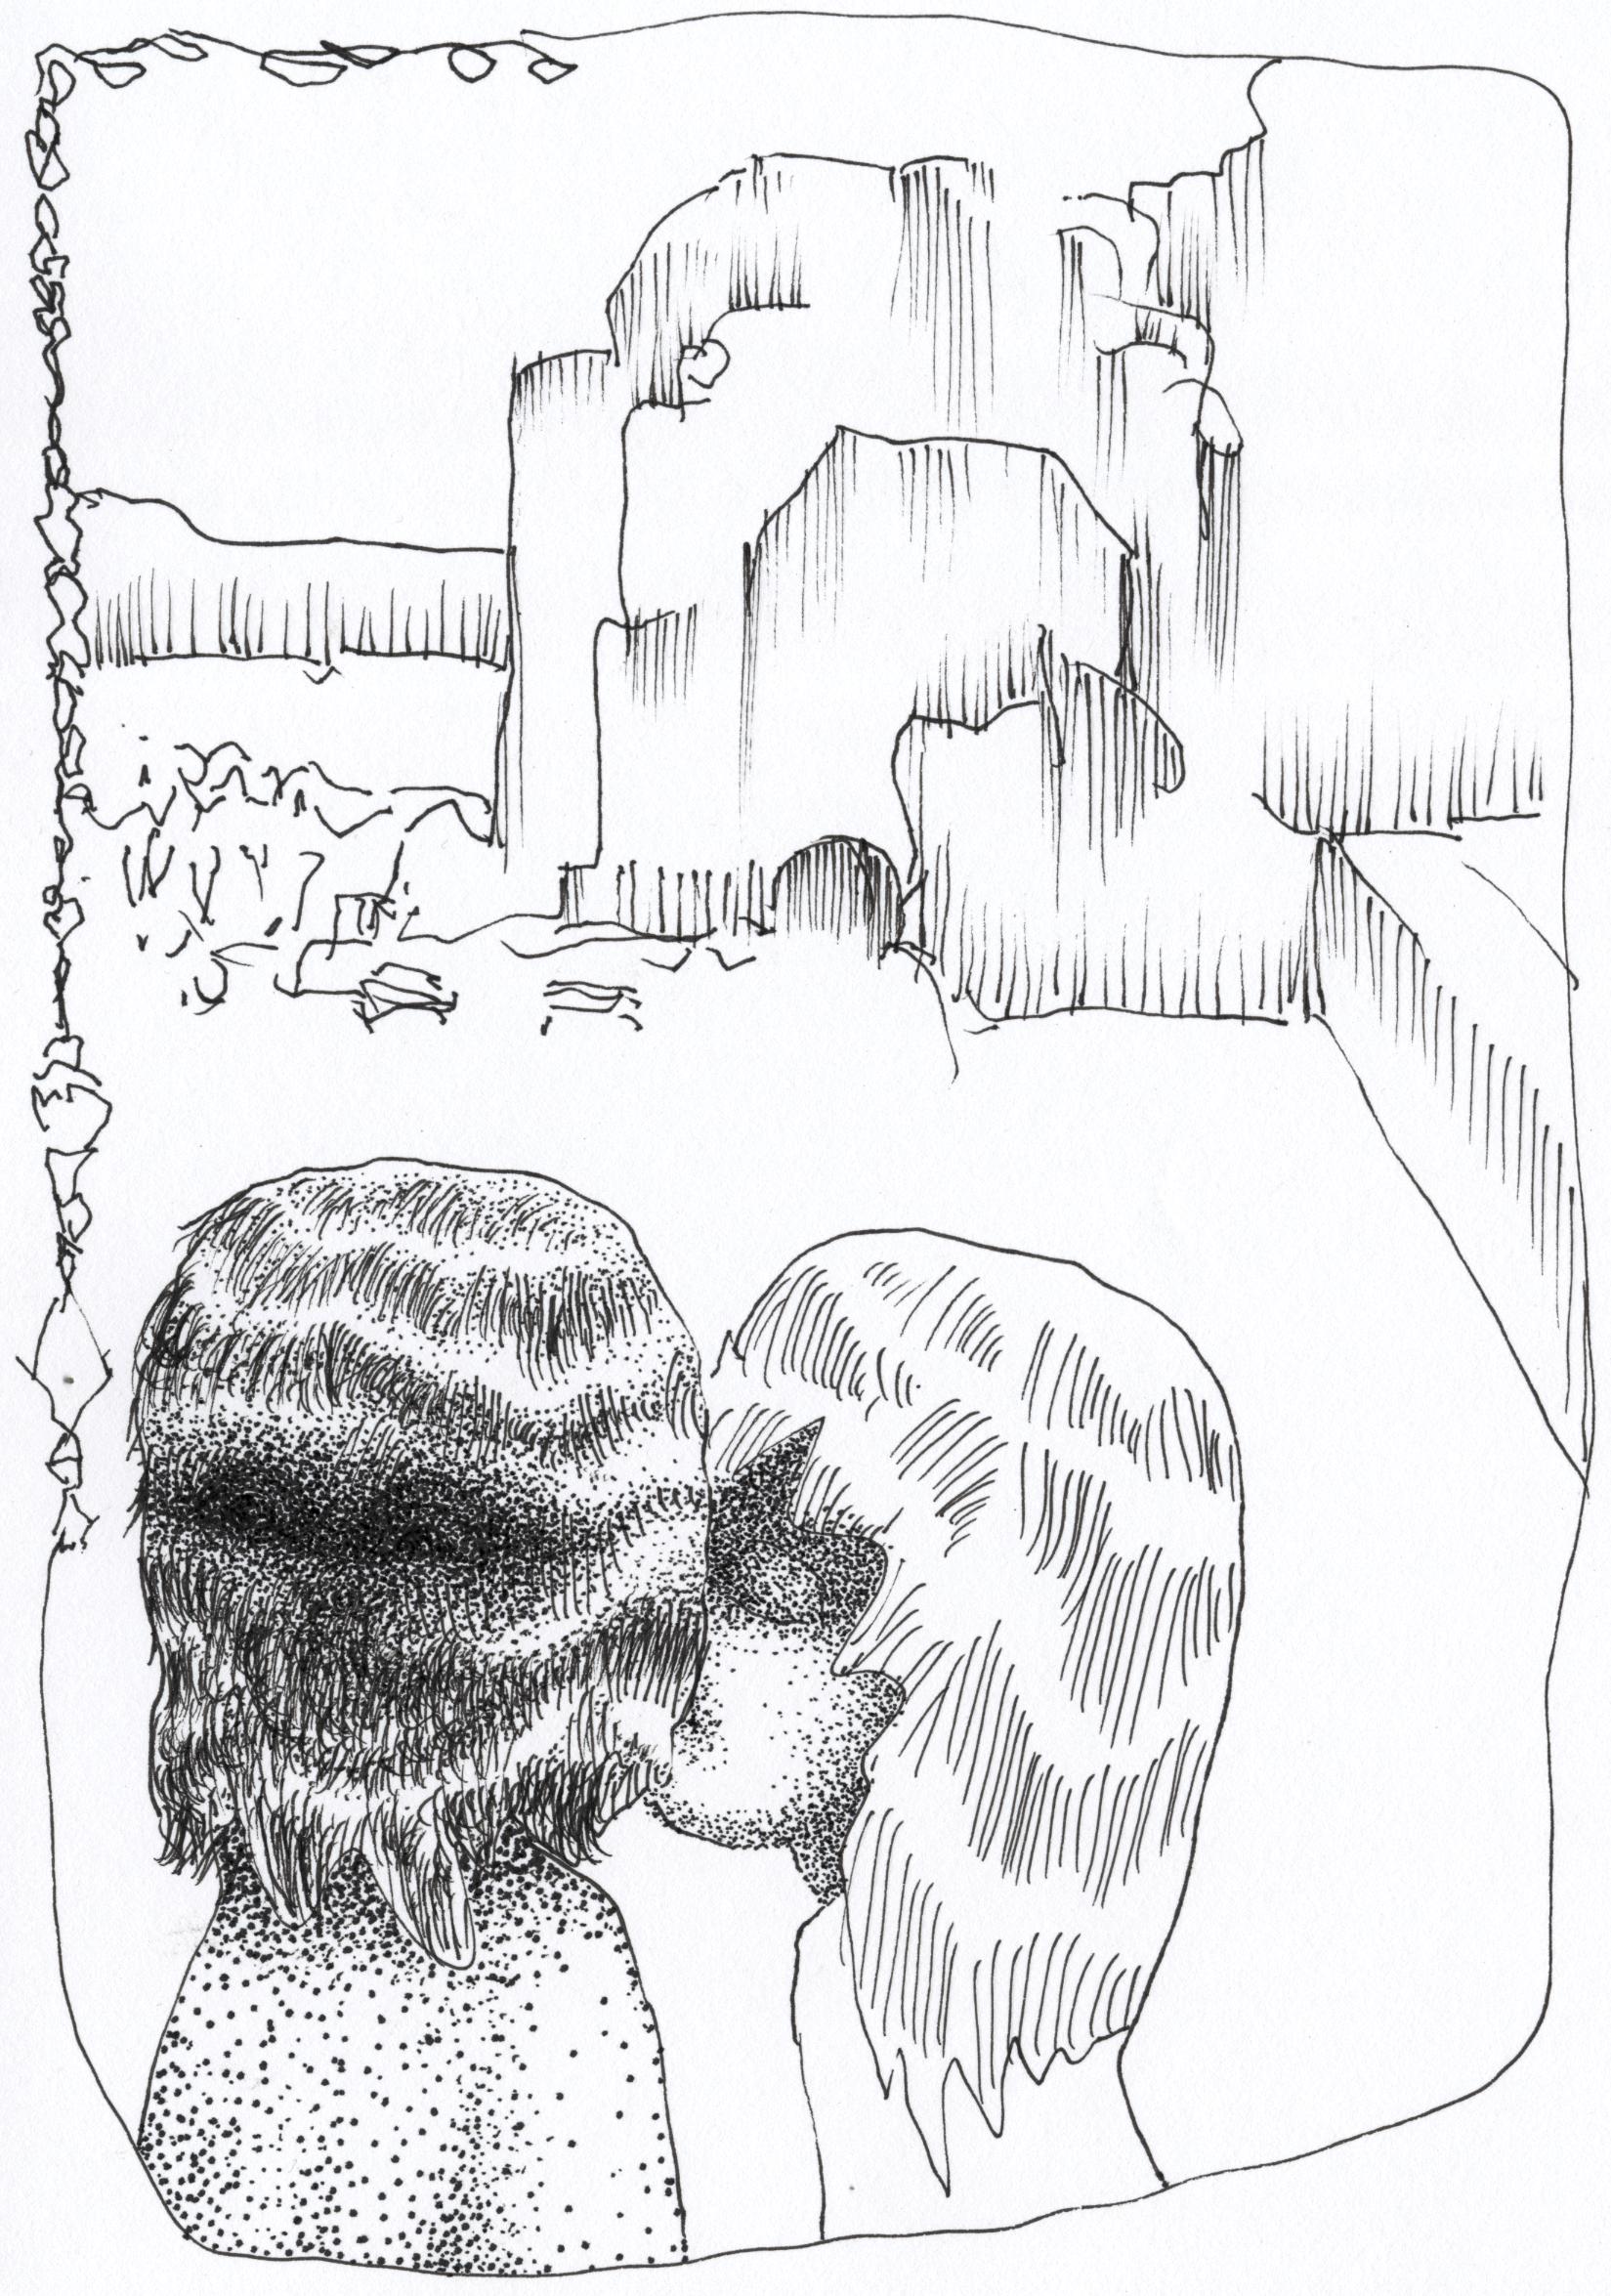 82 sketchbook 038